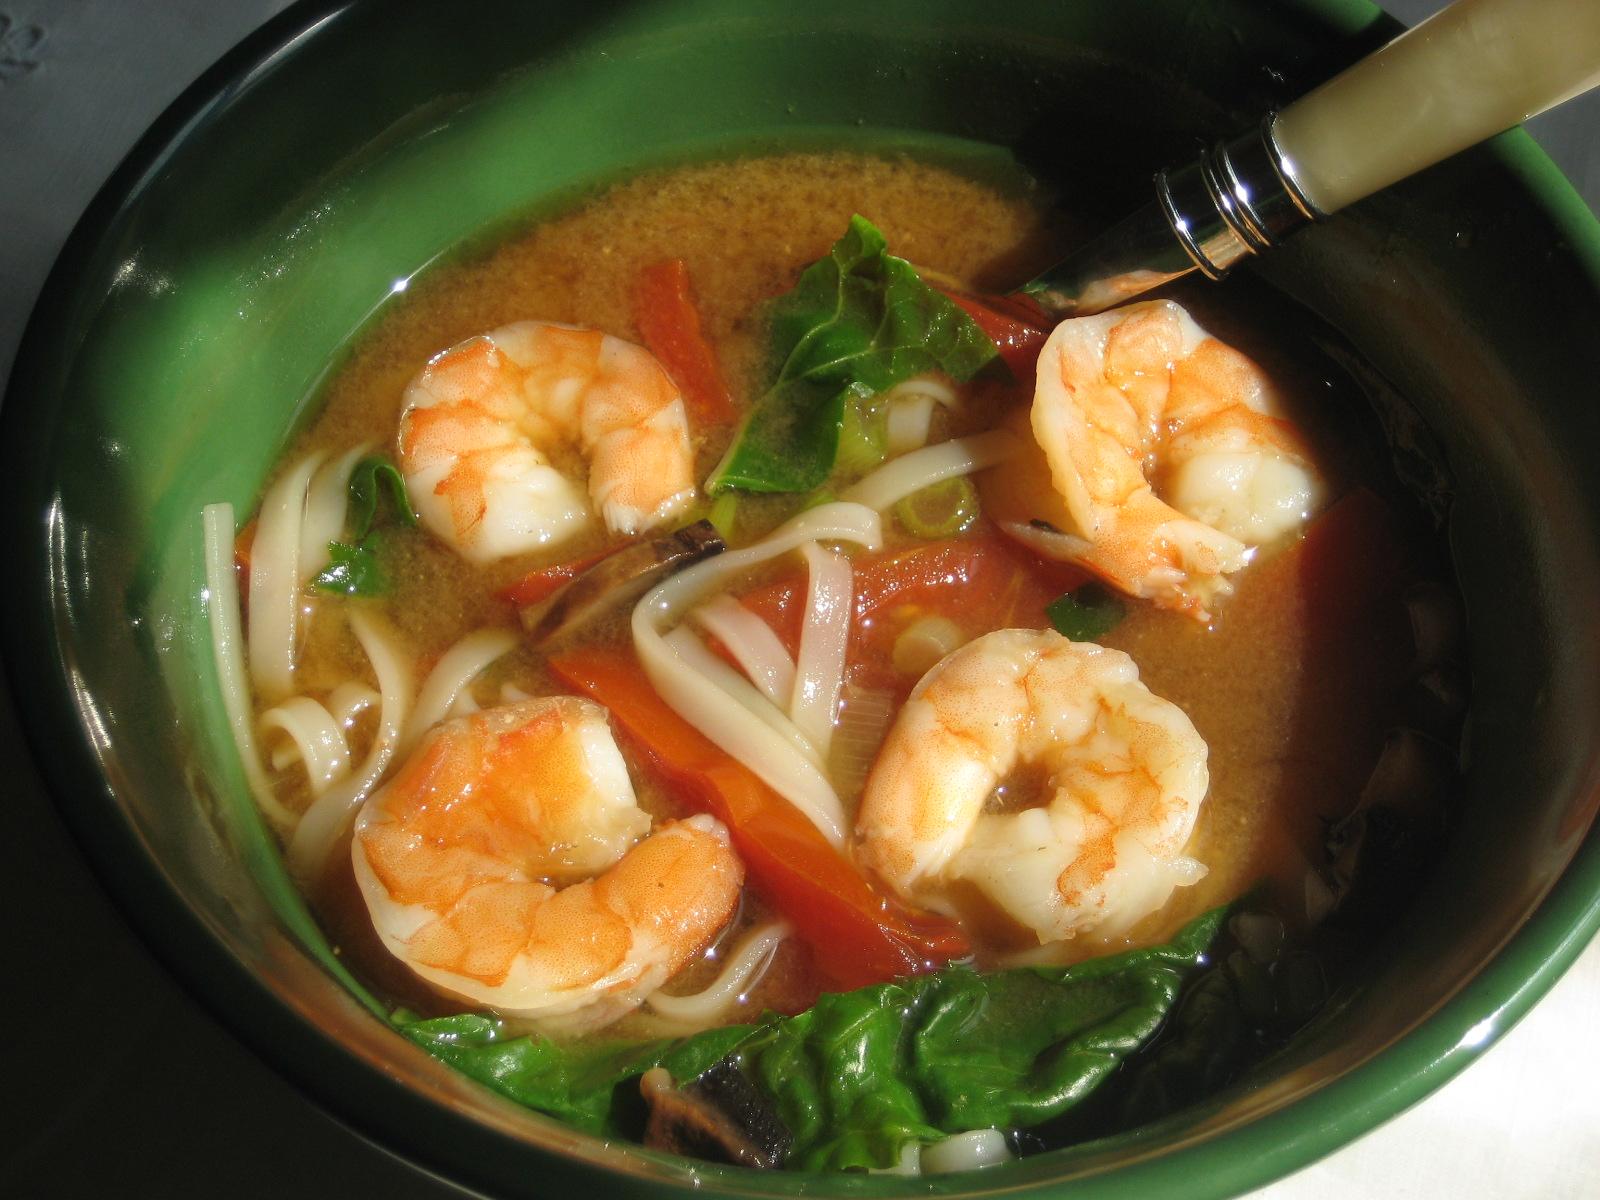 10-Minute Veggie, Shrimp & Miso Soup | Tasty Kitchen: A Happy Recipe ...